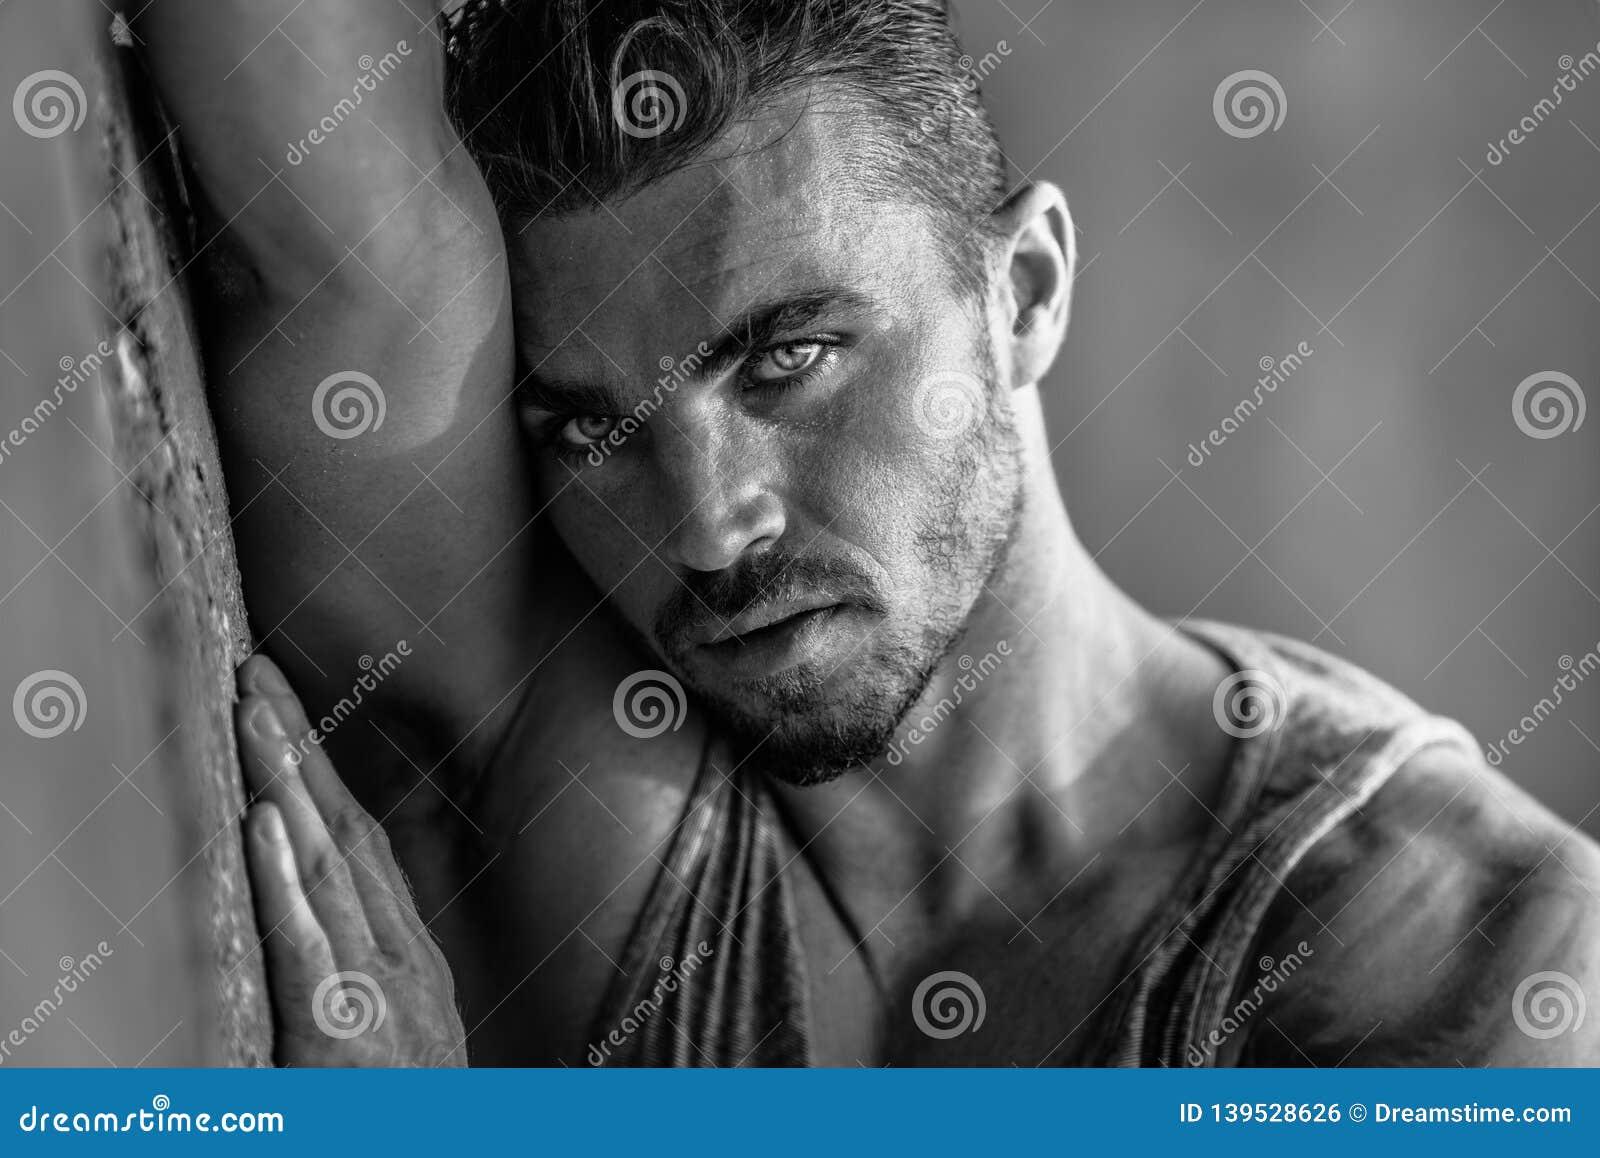 Handsome caucasian male model posing in black and white portrait